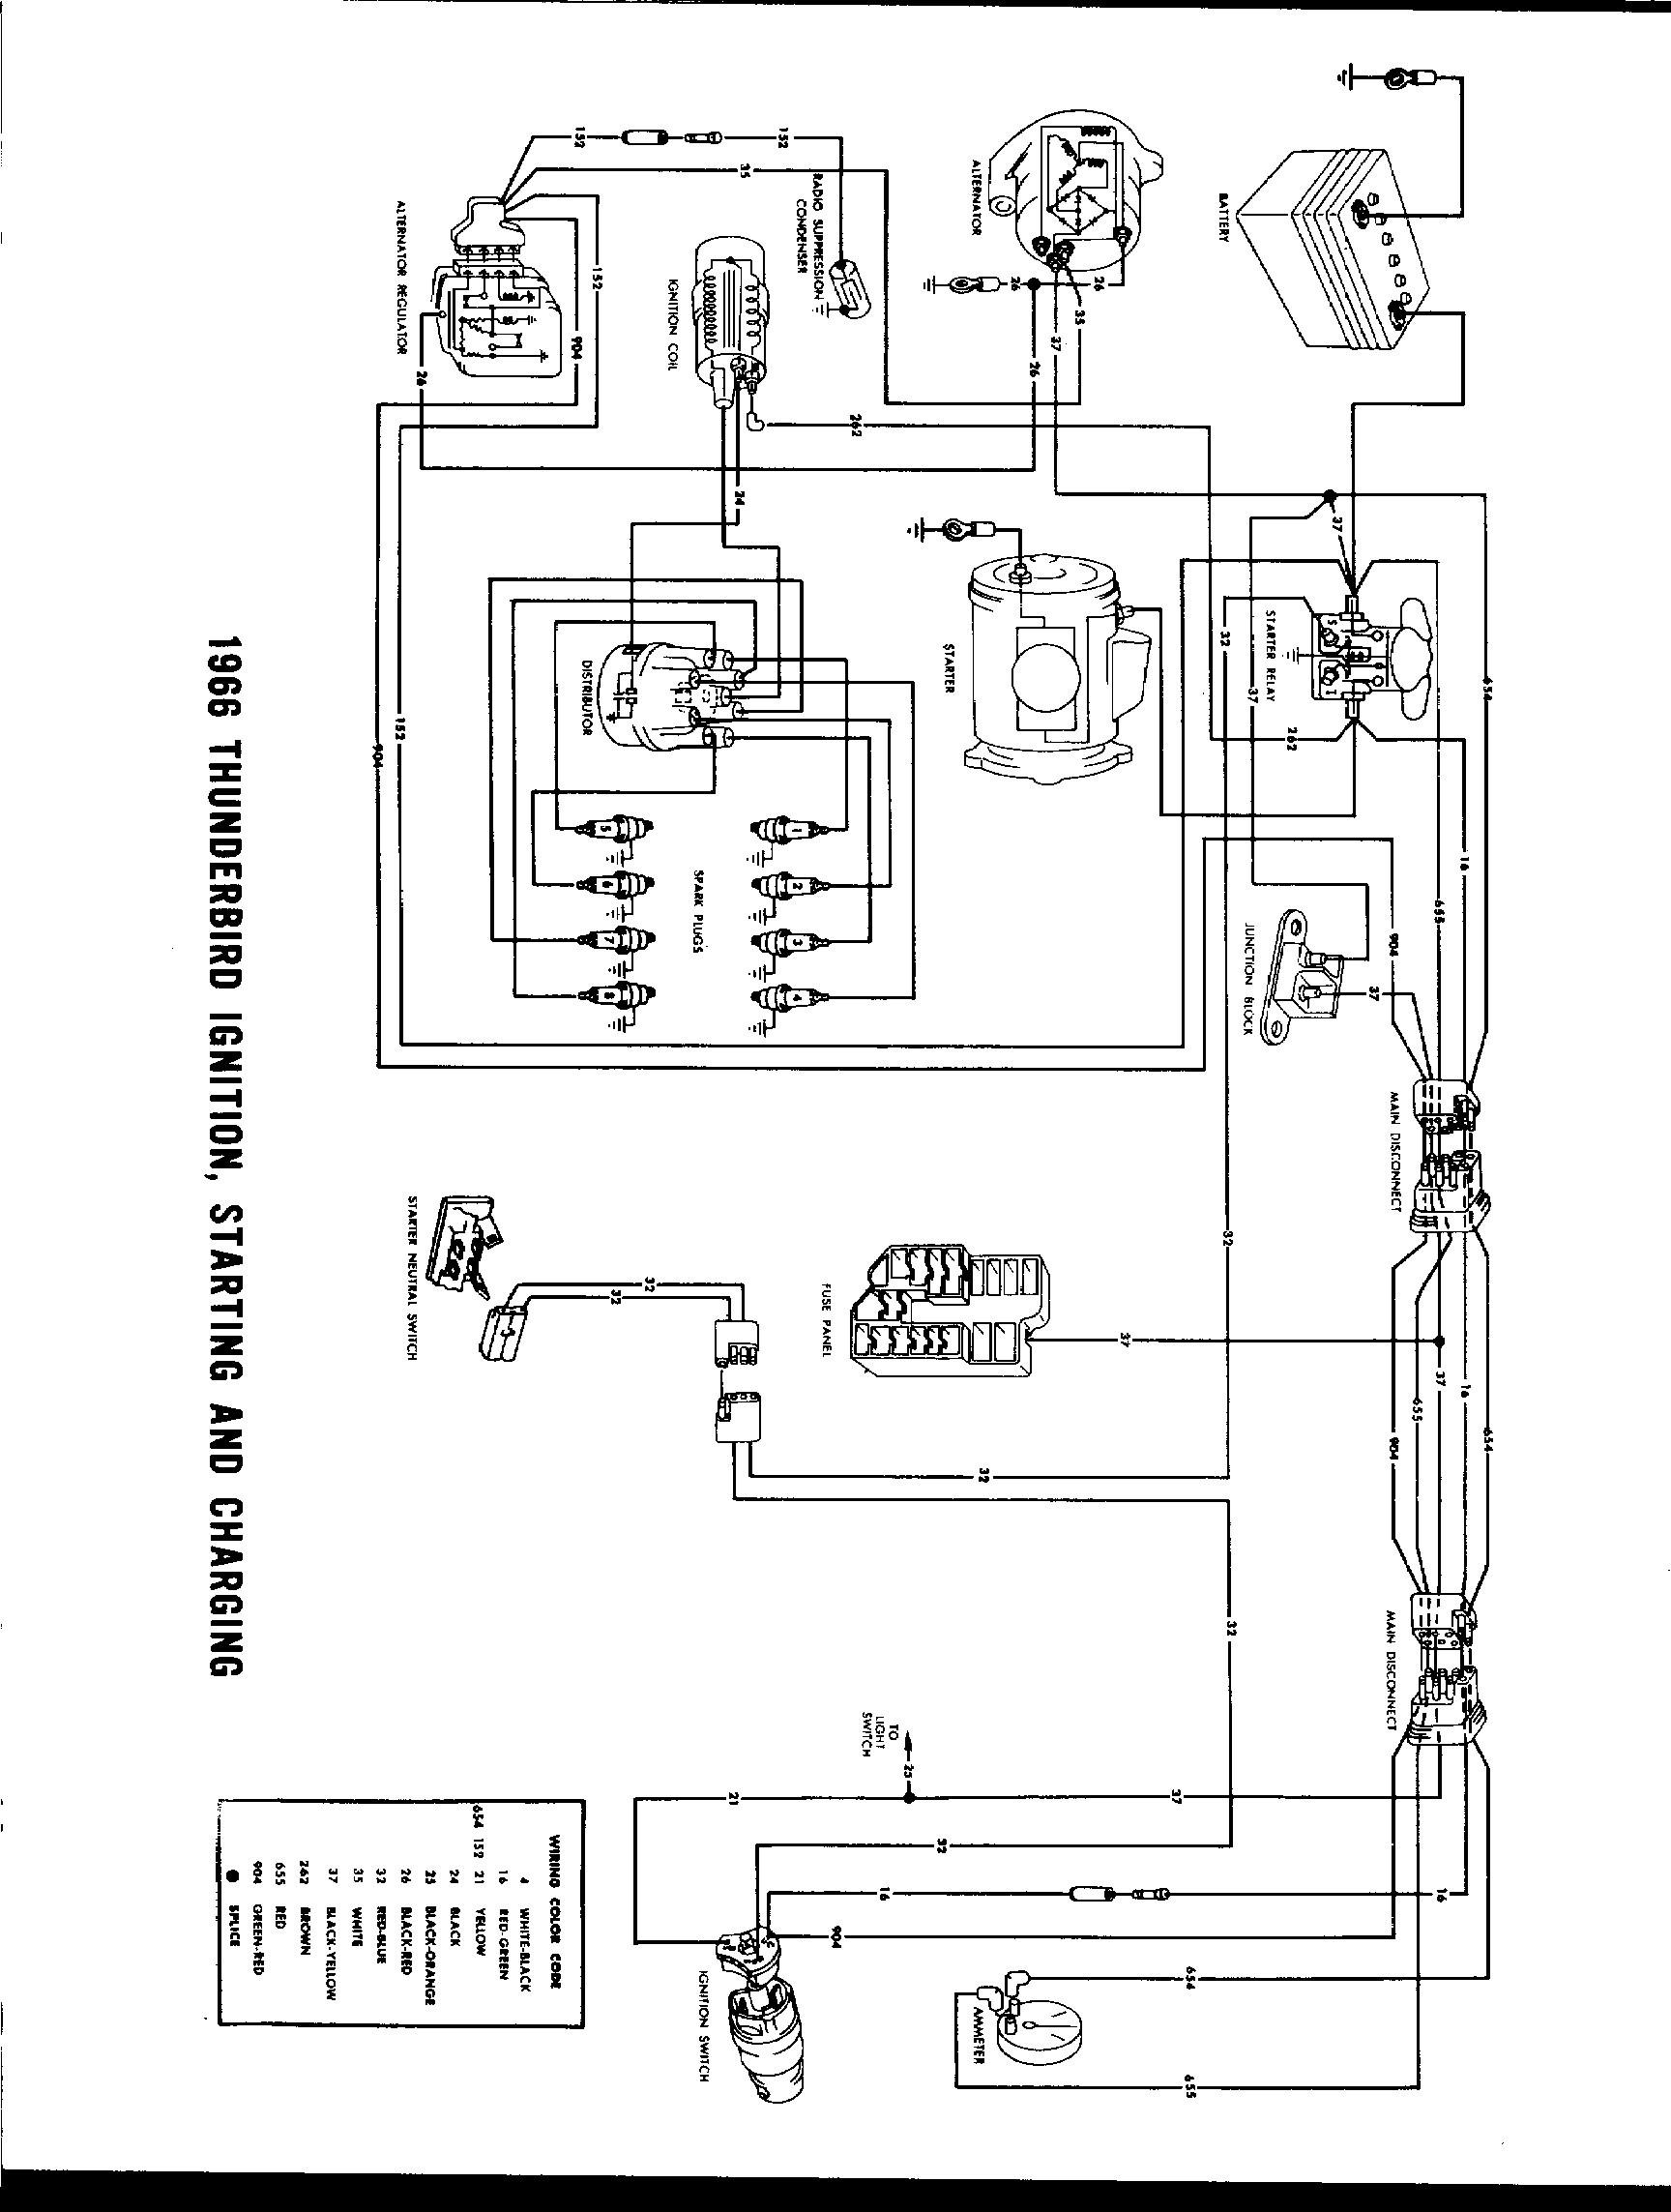 electric hydraulic pump wiring diagram honeywell thermostat 4 wire 12 volt my